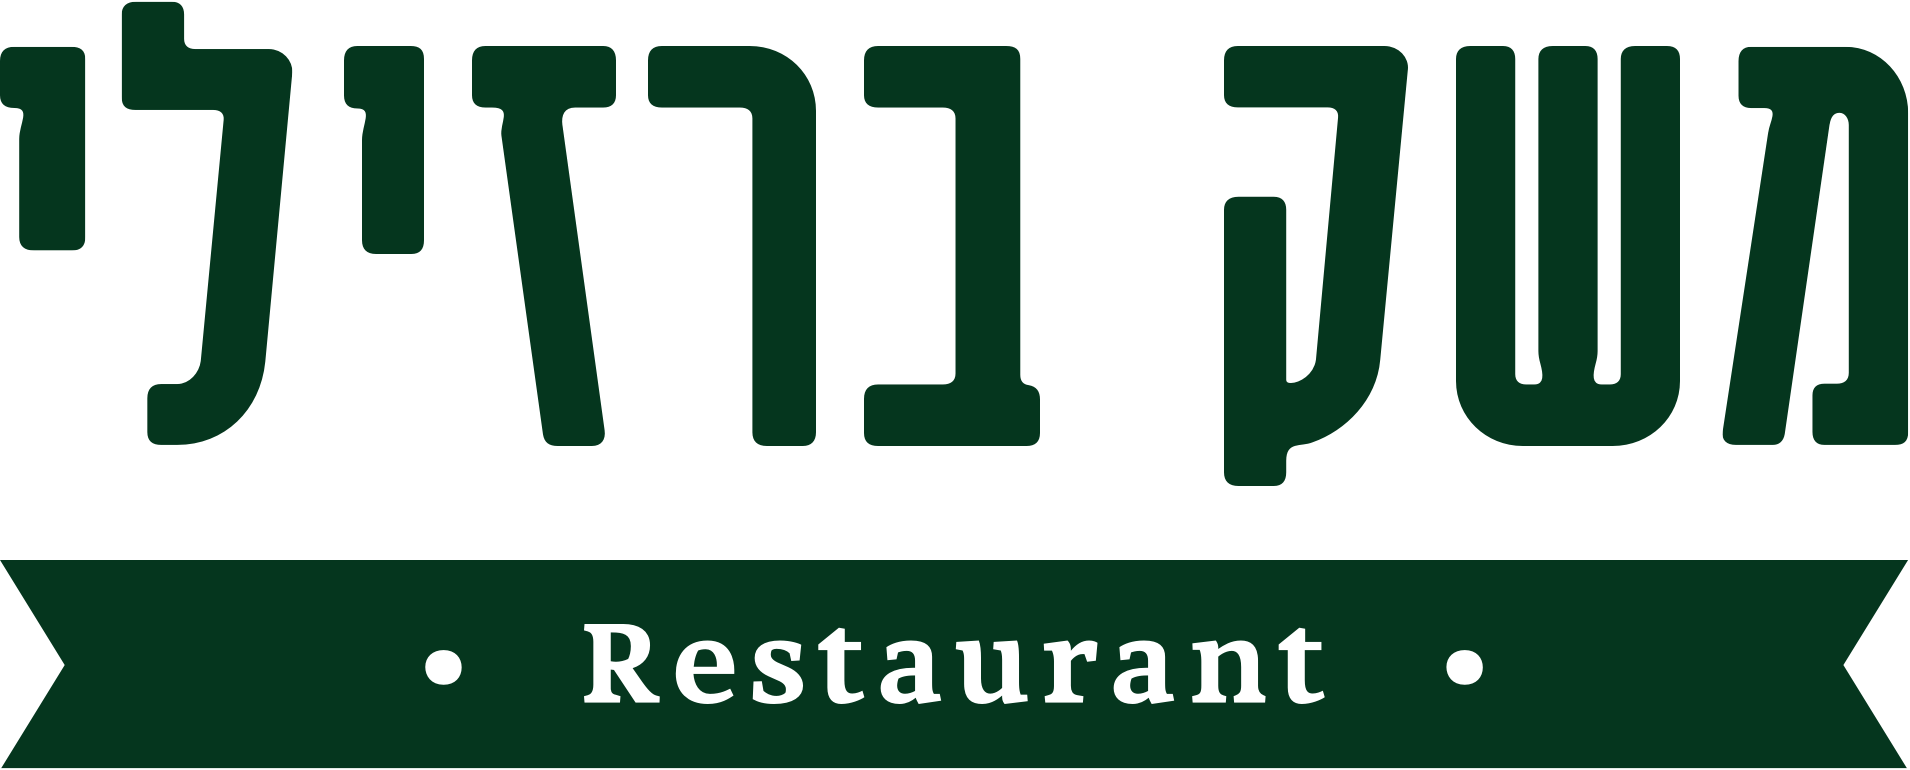 Meshek Barzilay - Restaurant